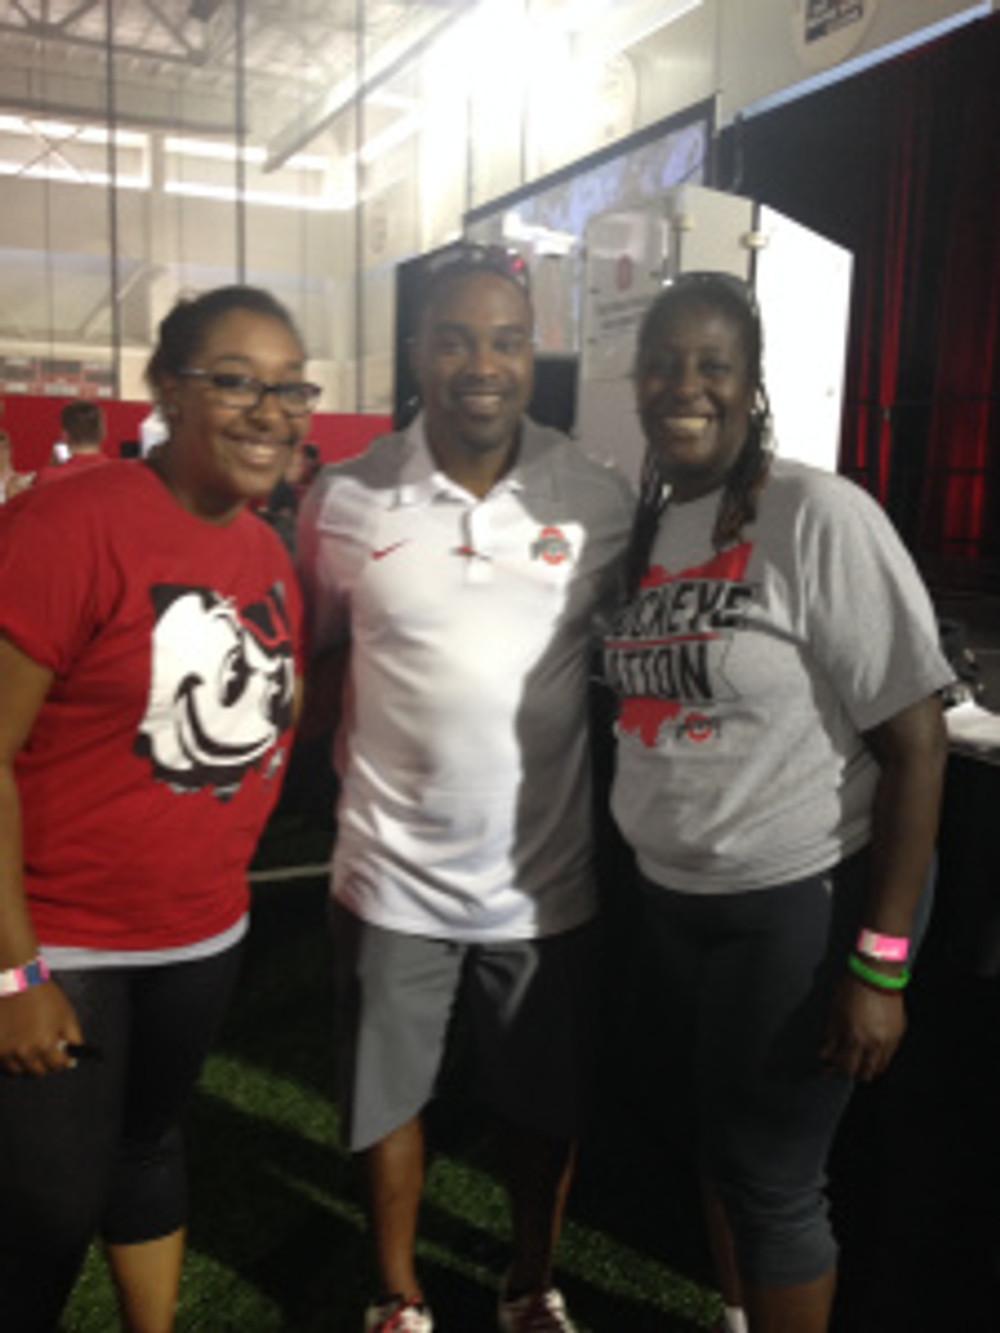 Jazmyn & I with OSU Buckeyes Running Back Coach, Stan Drayton, at the 2014 OSU Buckeyes Women's Football Clinic